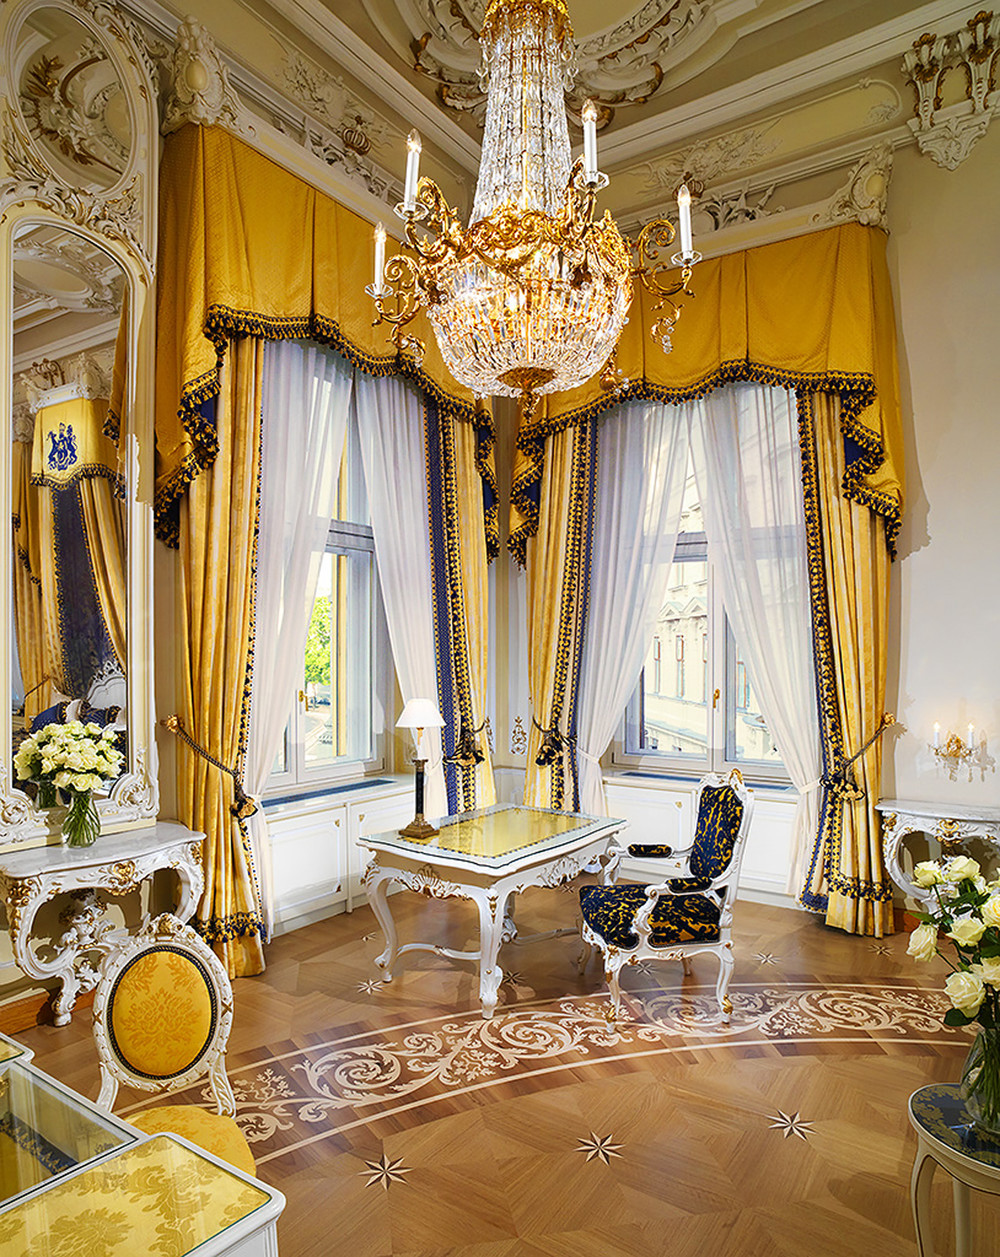 ST - Hotel Imperial Vienna - Royal Suite - 1.jpg